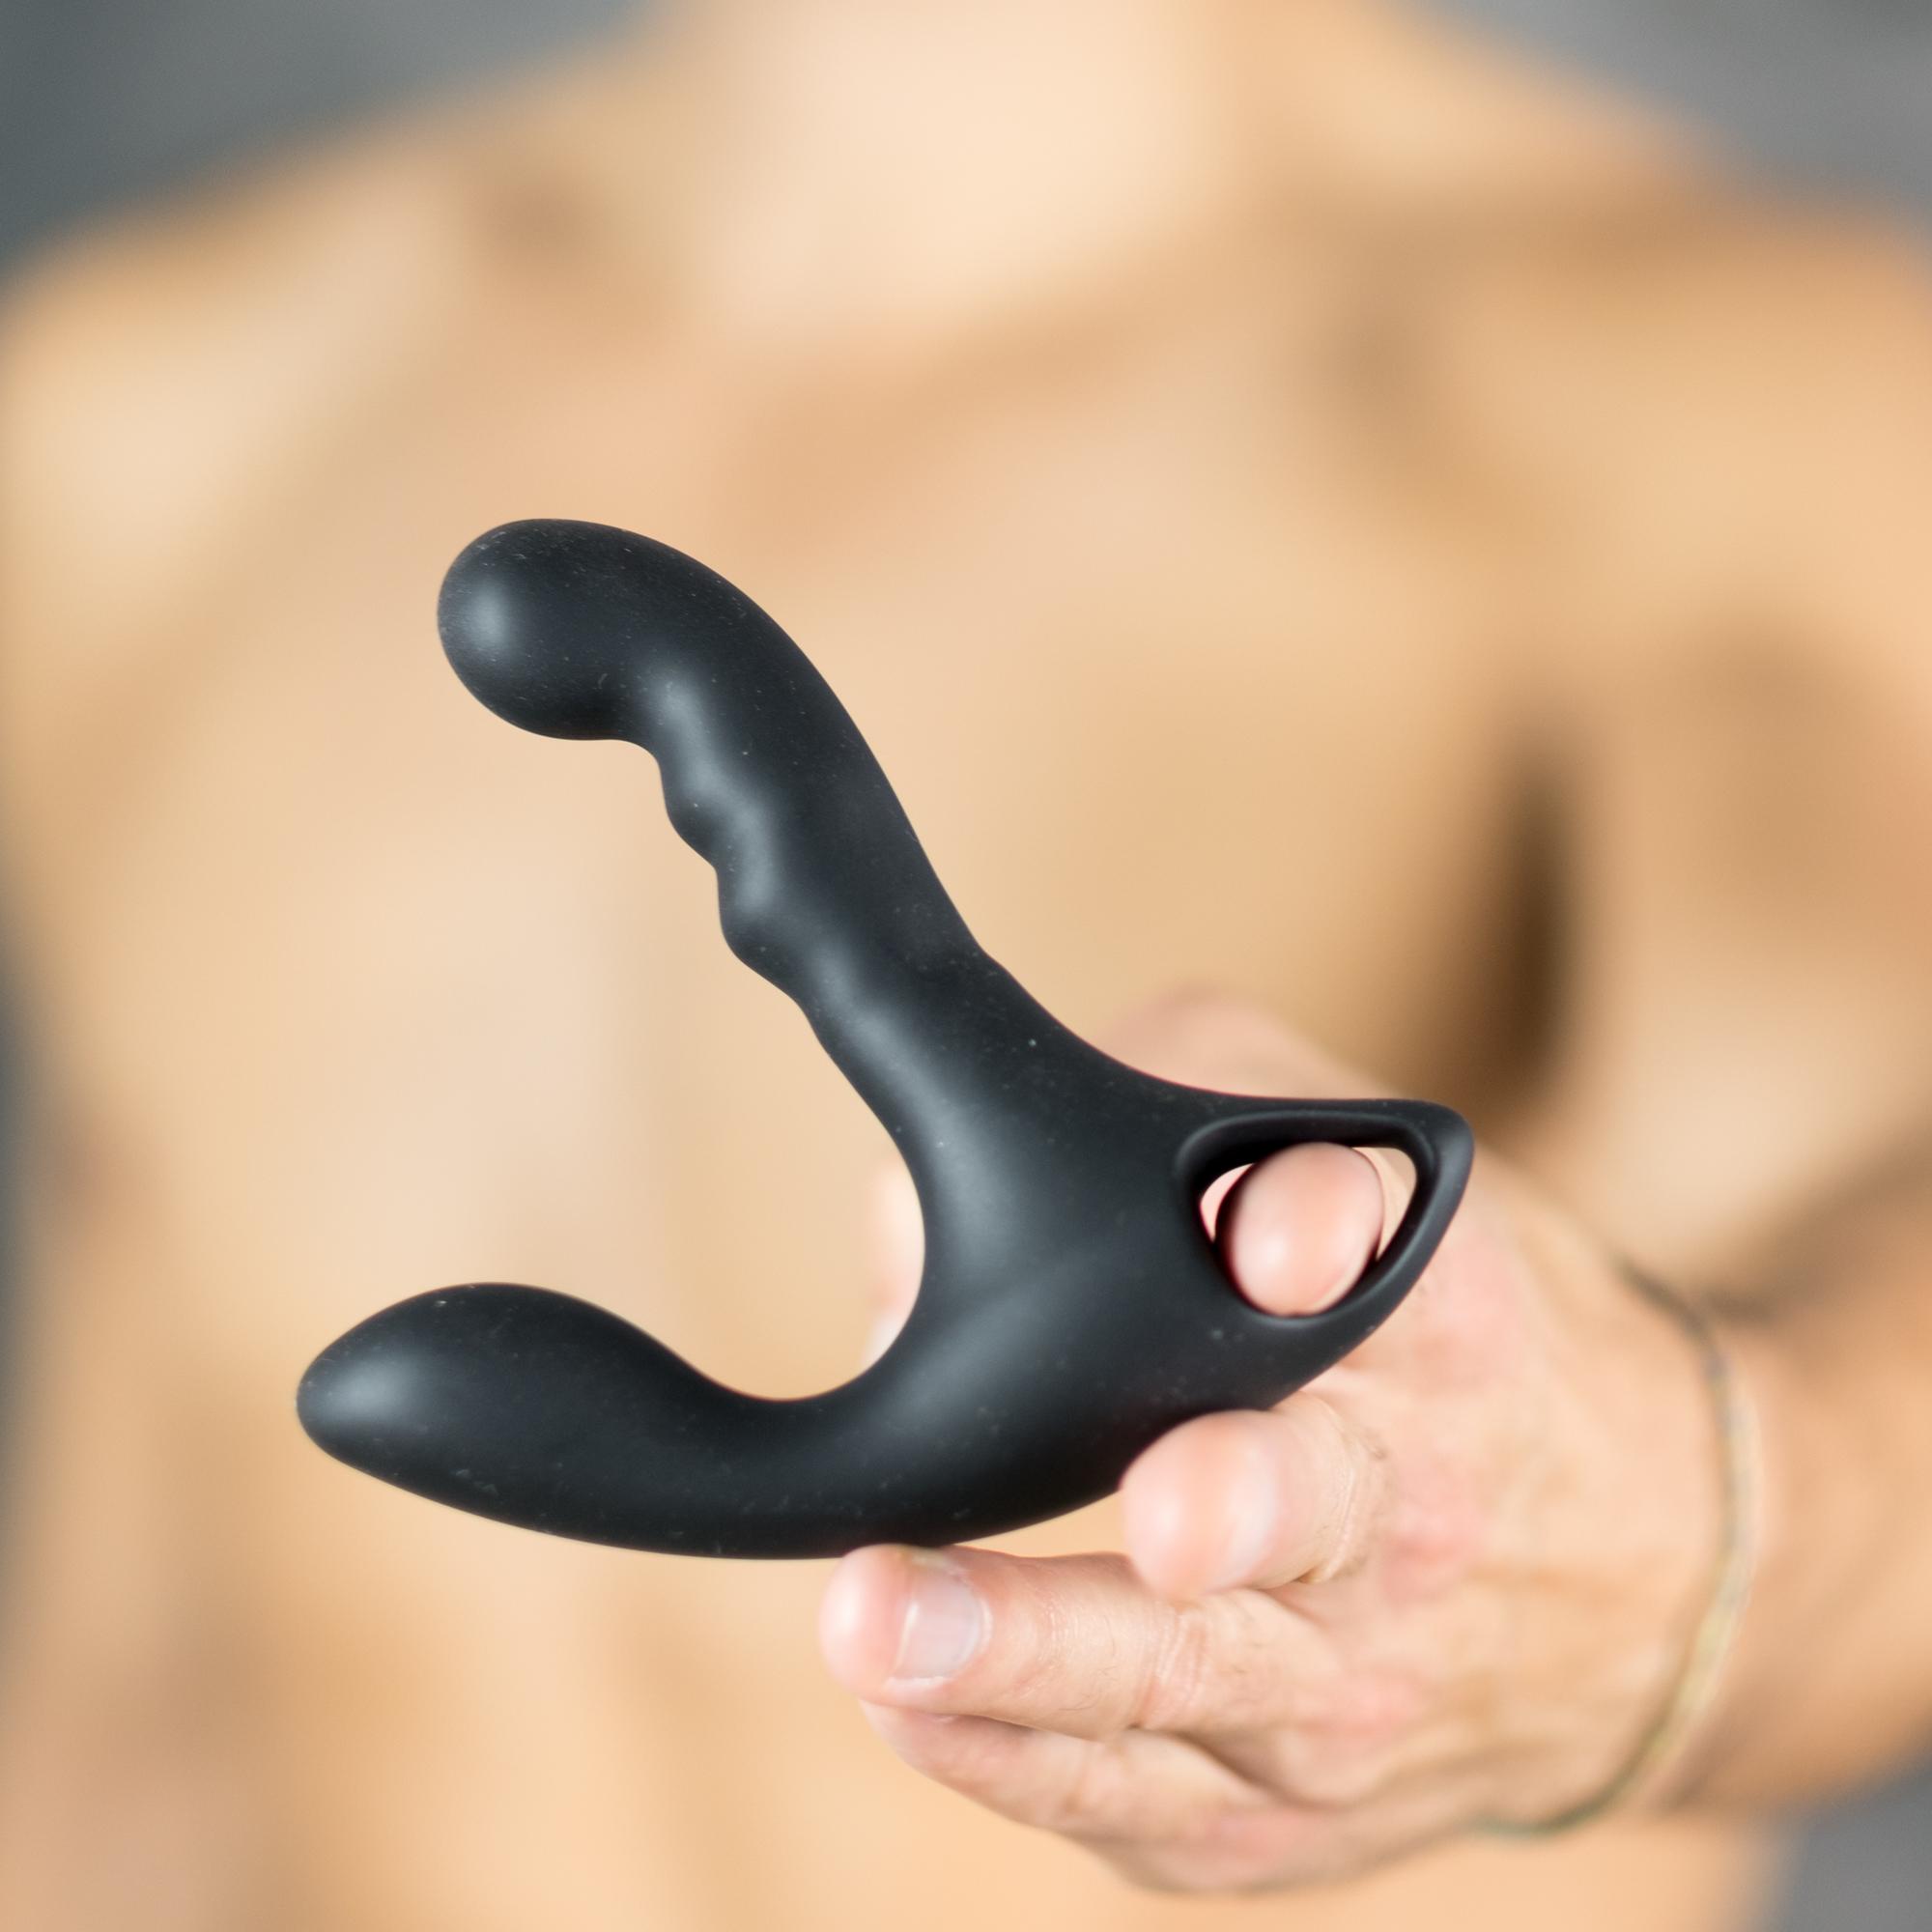 Prostata selber massieren